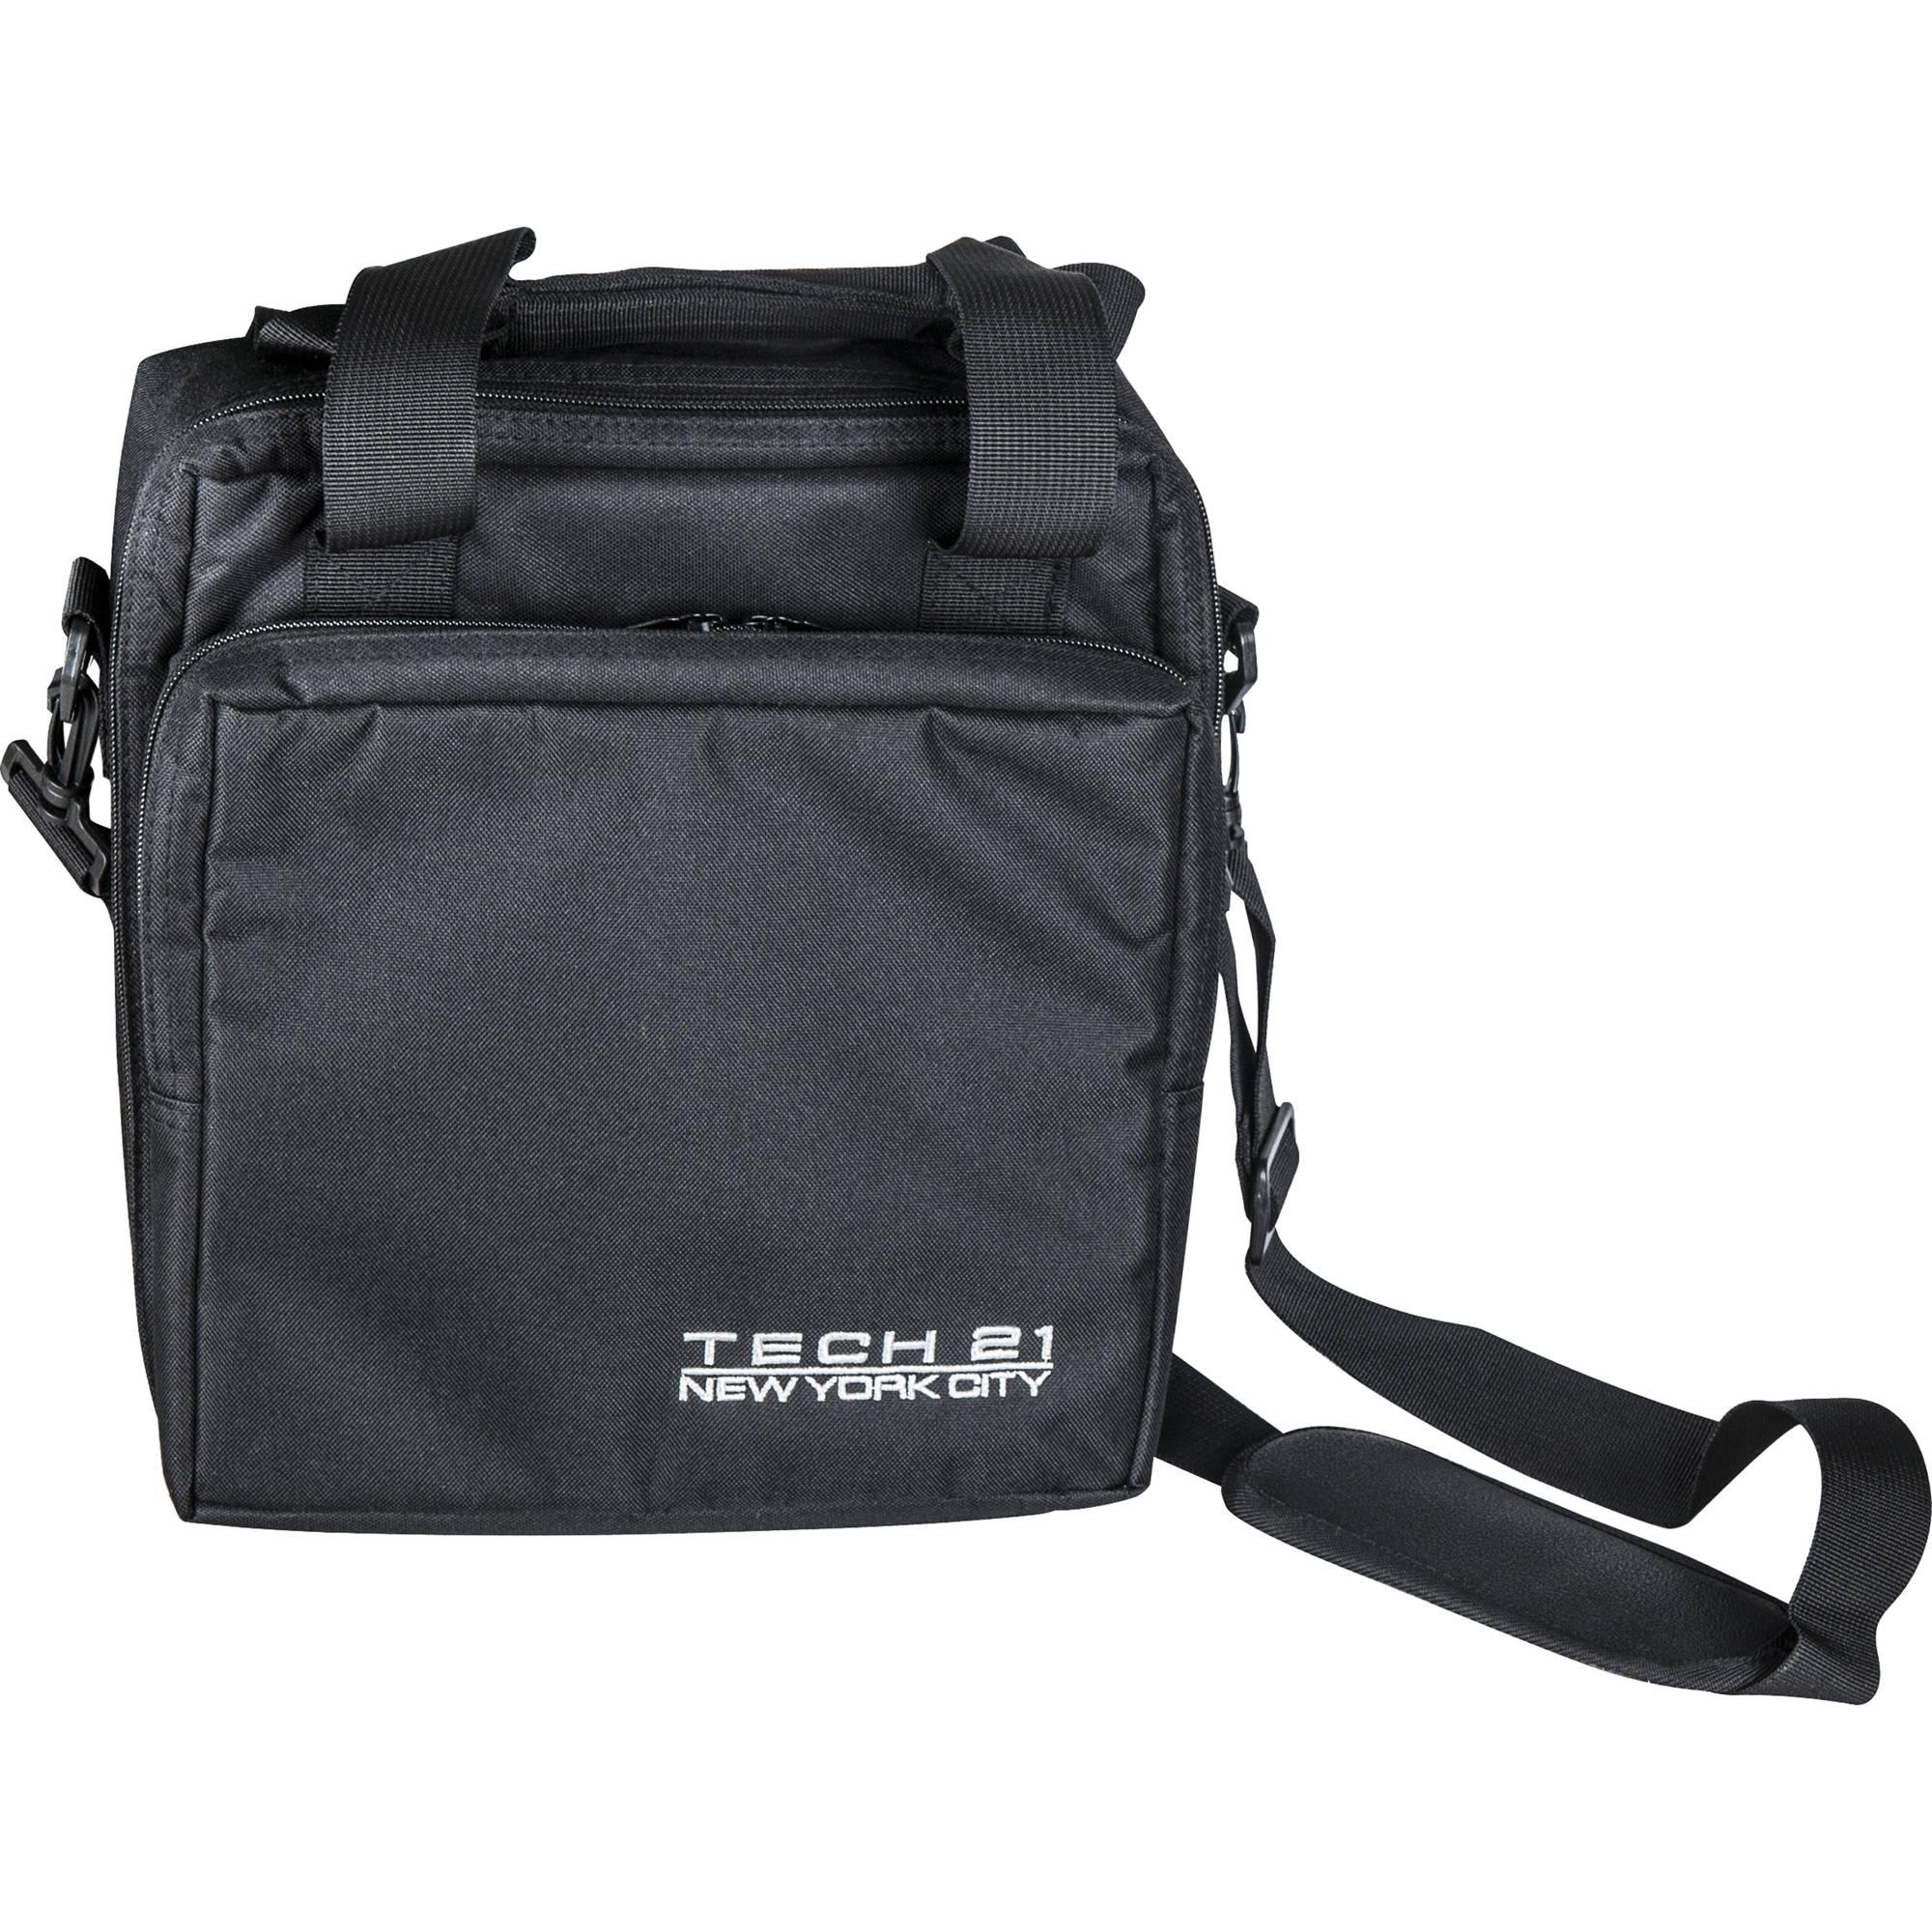 Tech21-Gig-Bag-borsa-per-VT-Bass-500-sku-2158737714001